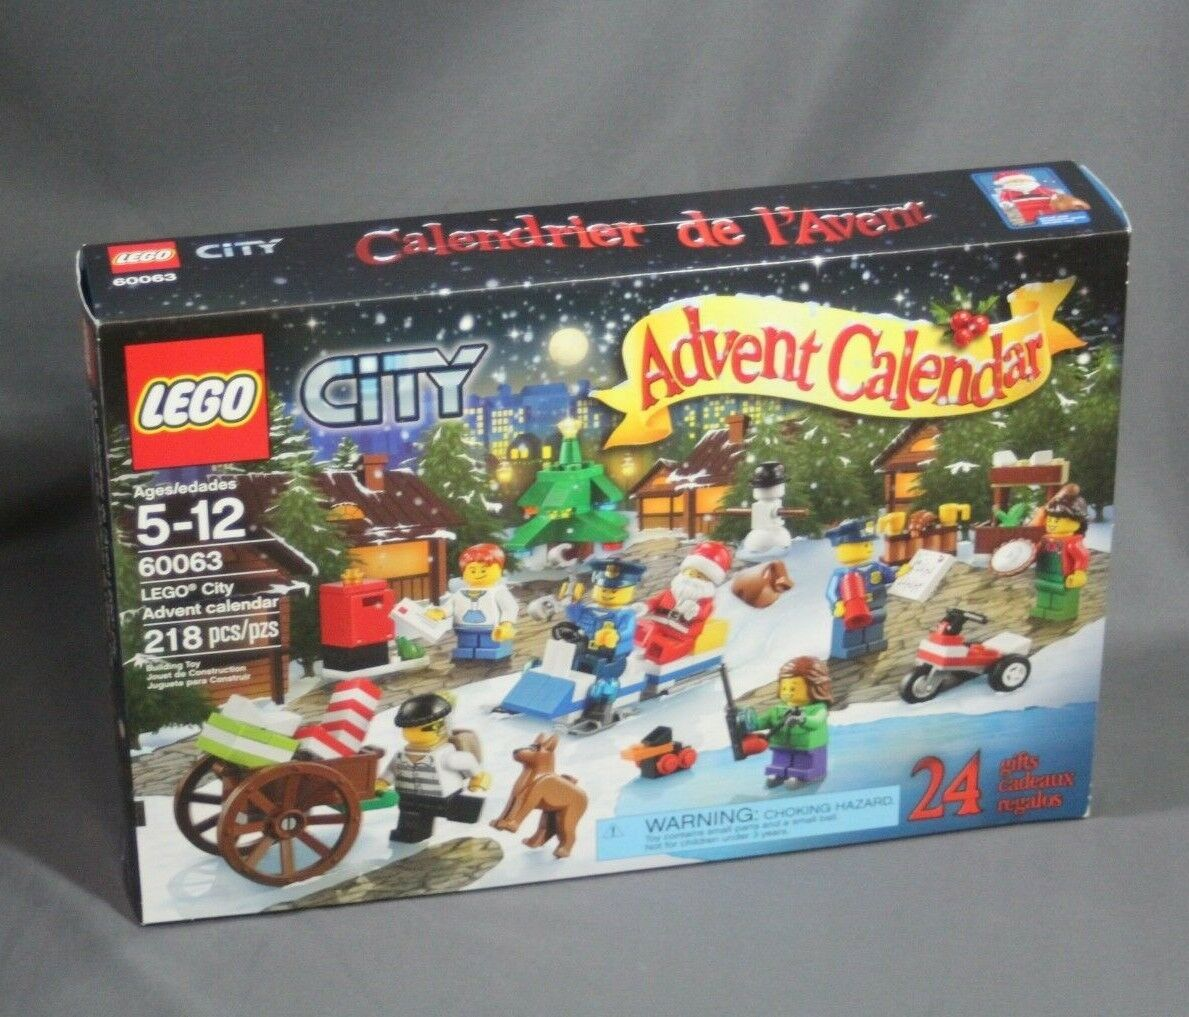 Factory Sealed - Lego City Advent Calendar 60063 2014 Christmas Holiday Set